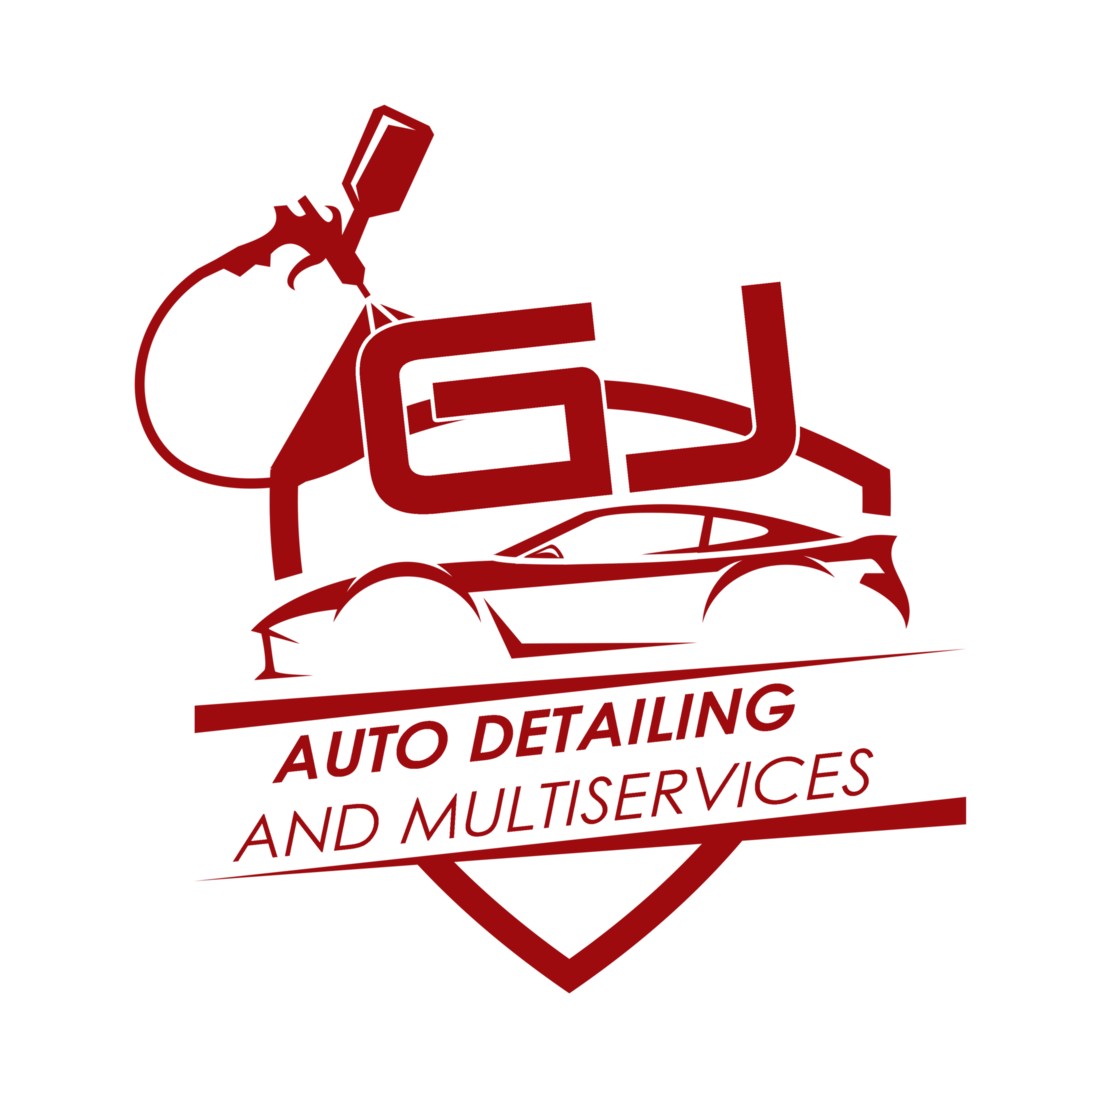 Manuel Indio - Logotypes